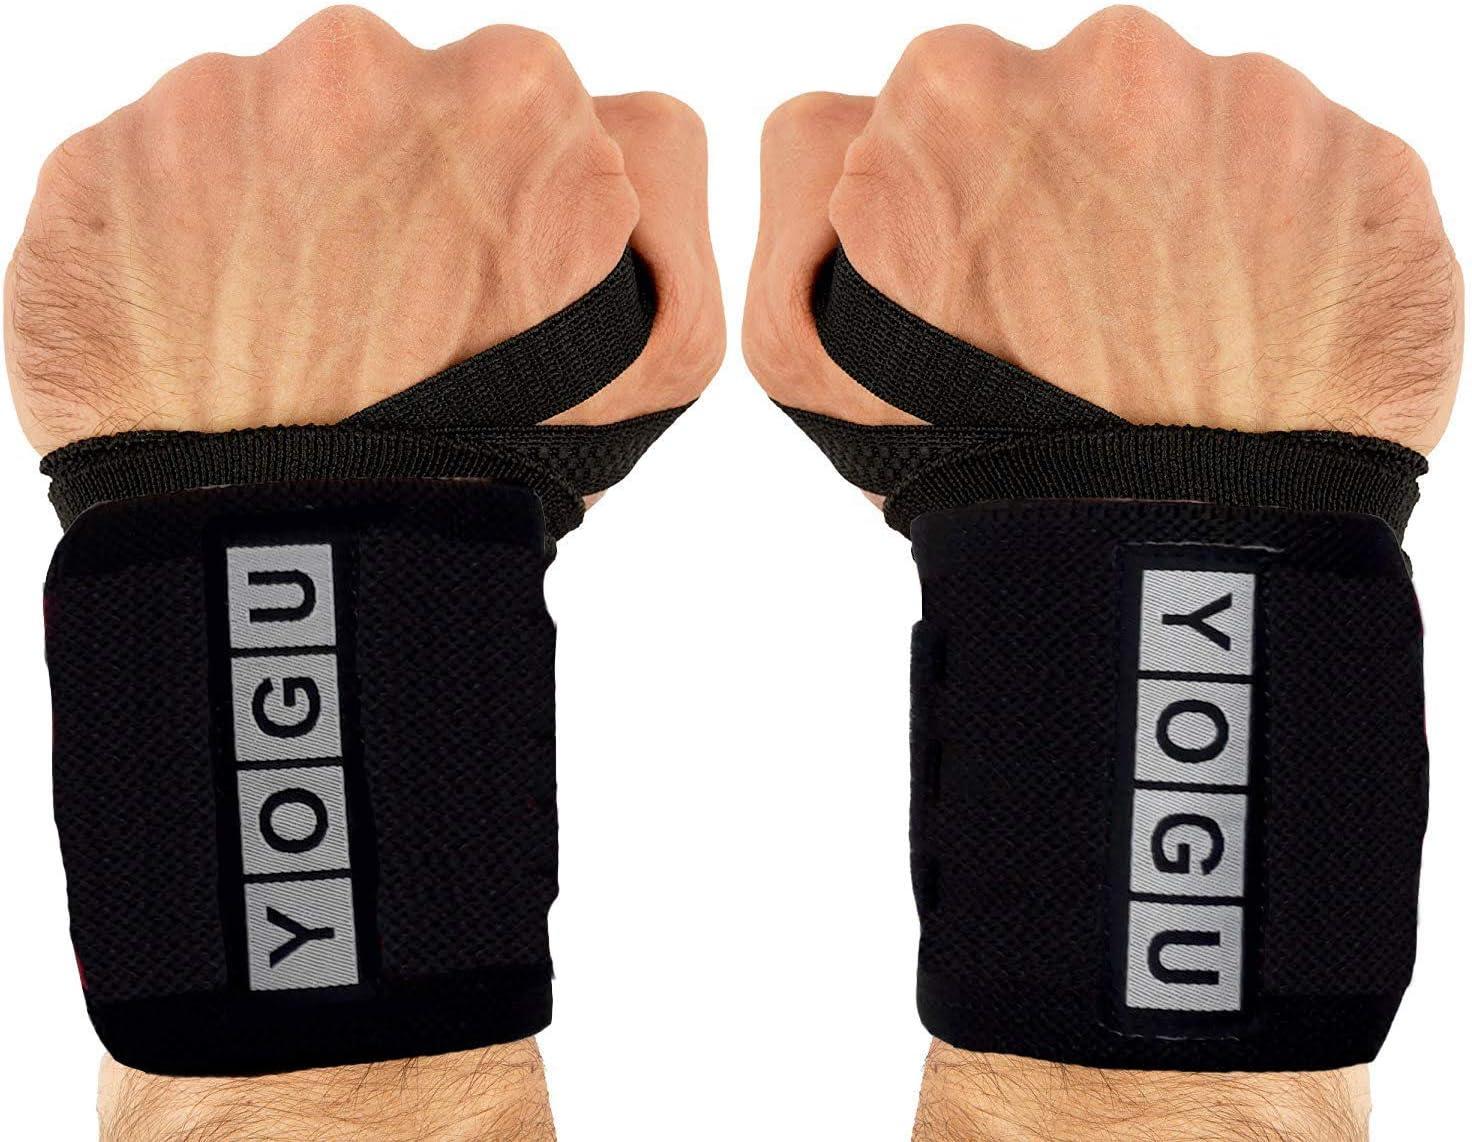 Wrist Workout Gym Lifting Weight Wrap Training Bodybuilding Crossfit Wraps Brace